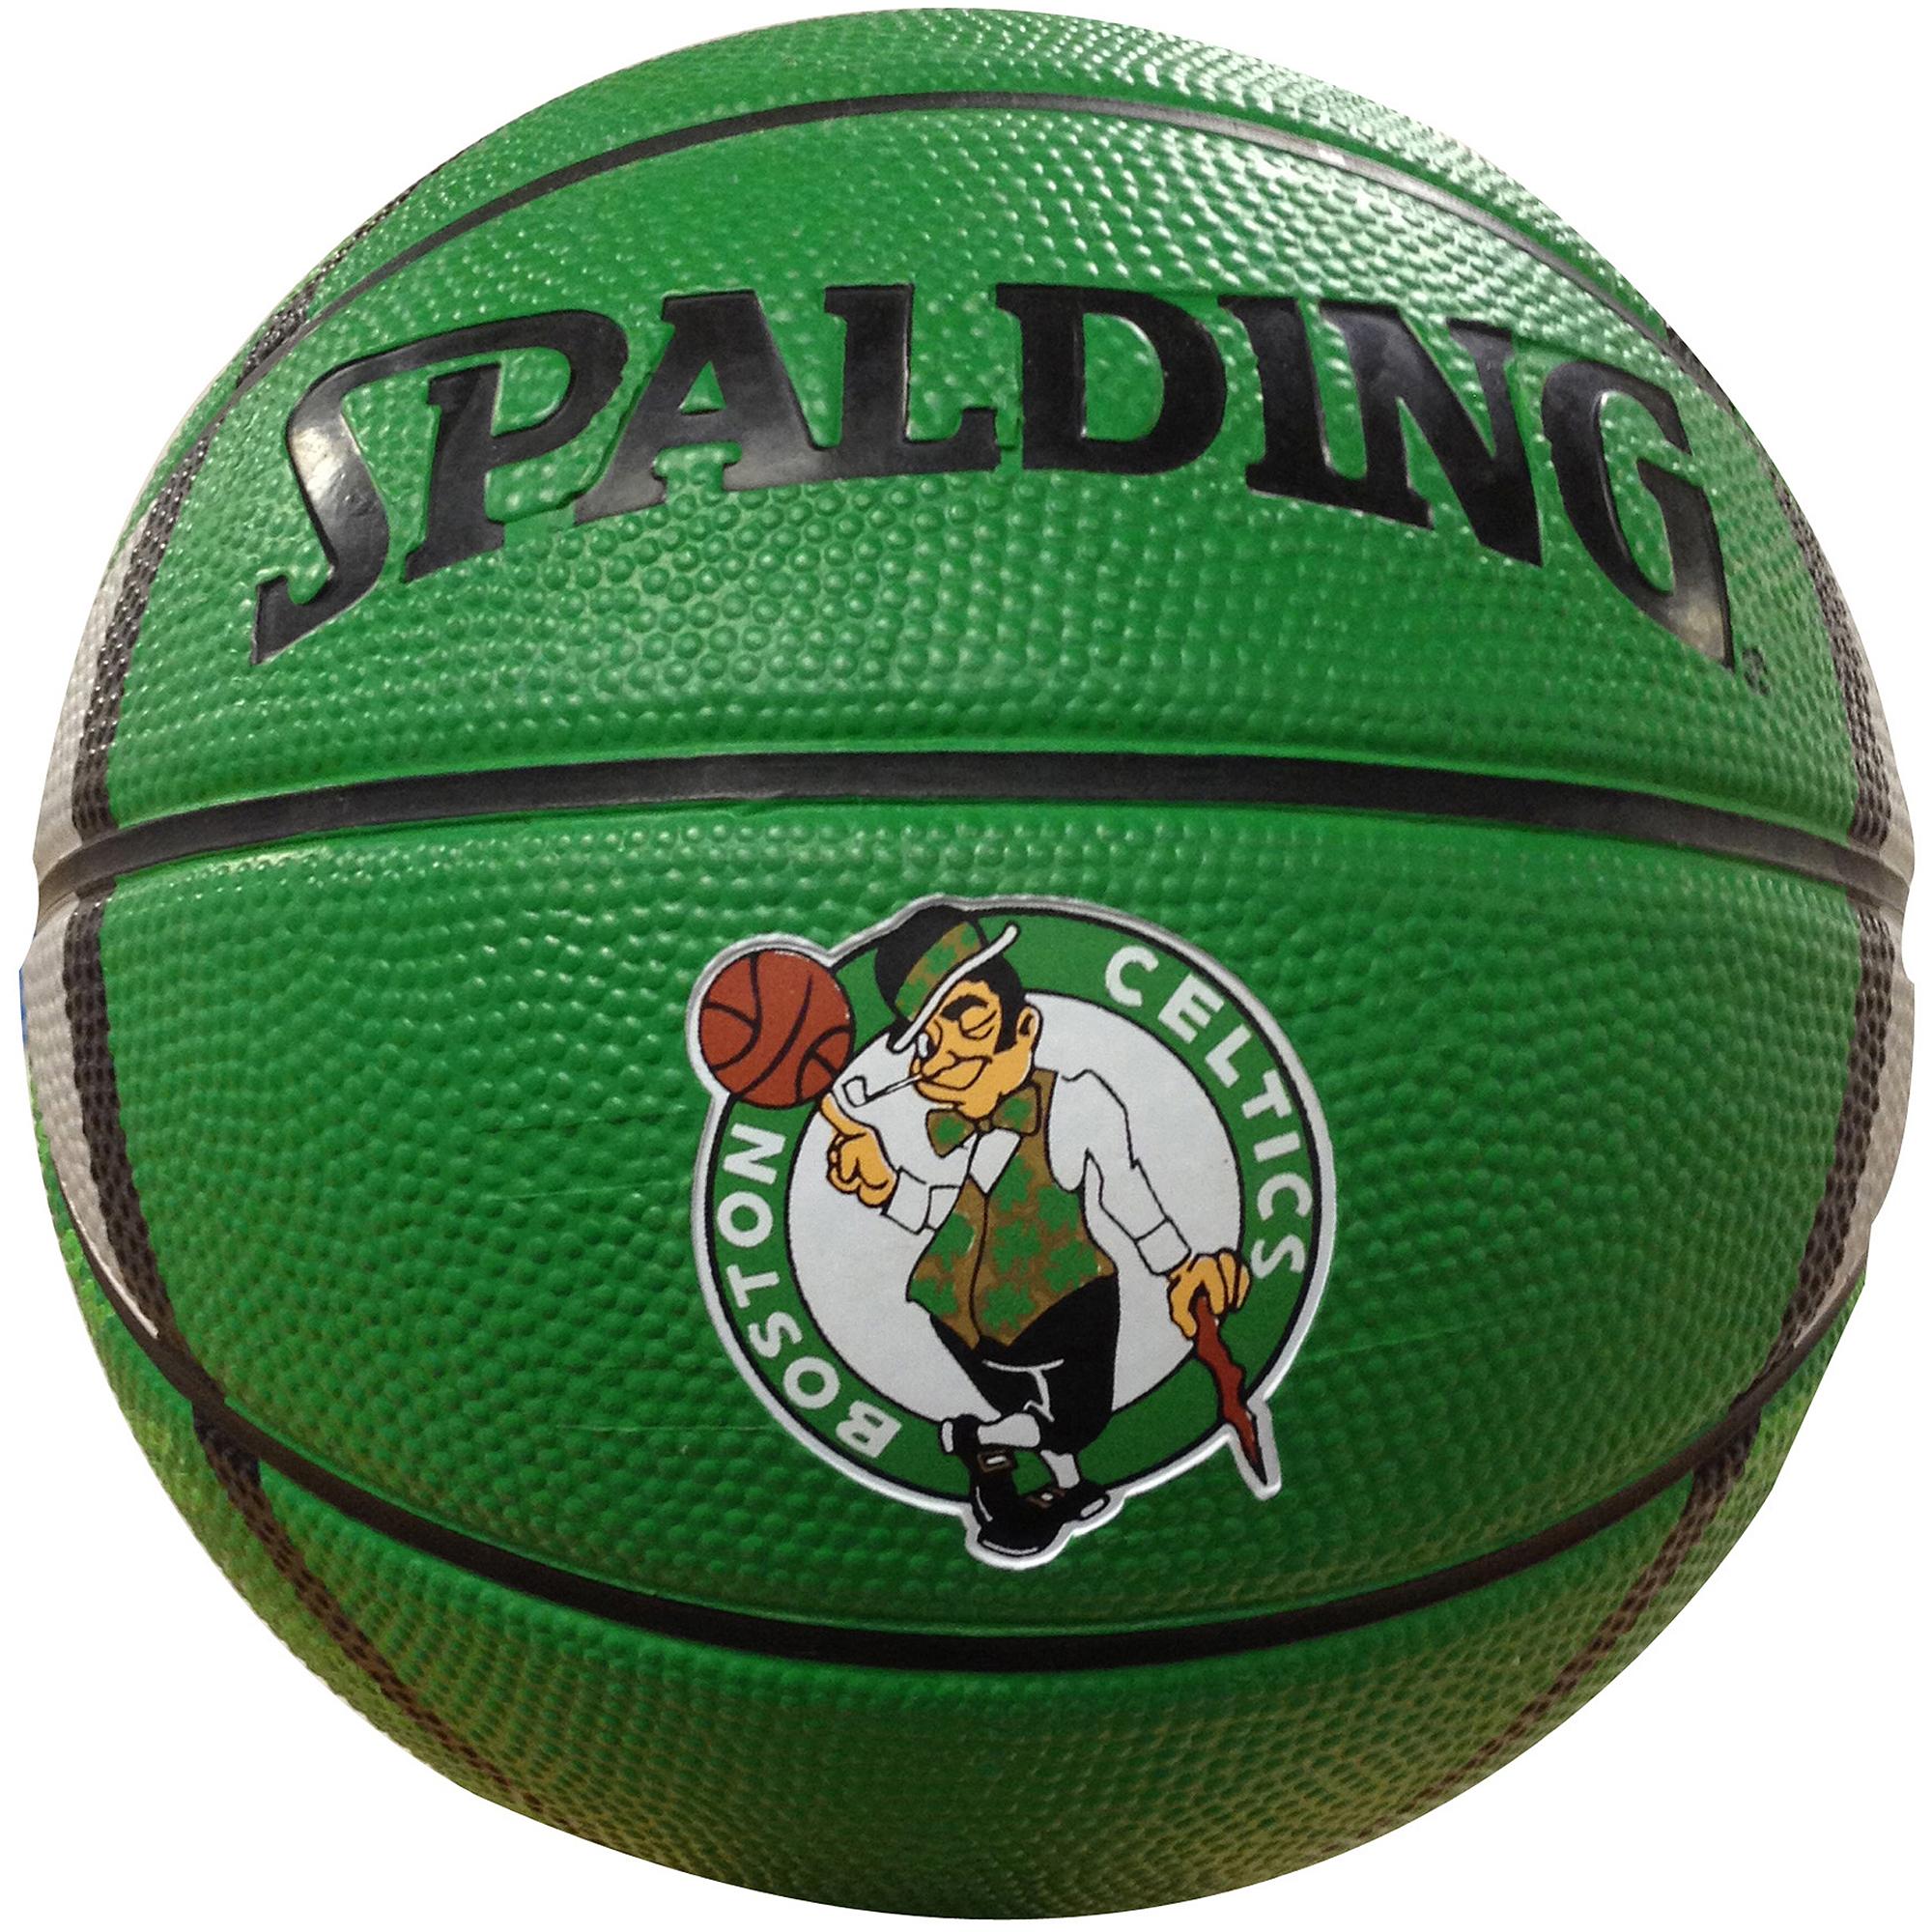 "Spalding NBA 7"" Mini Basketball, Boston Celtics"